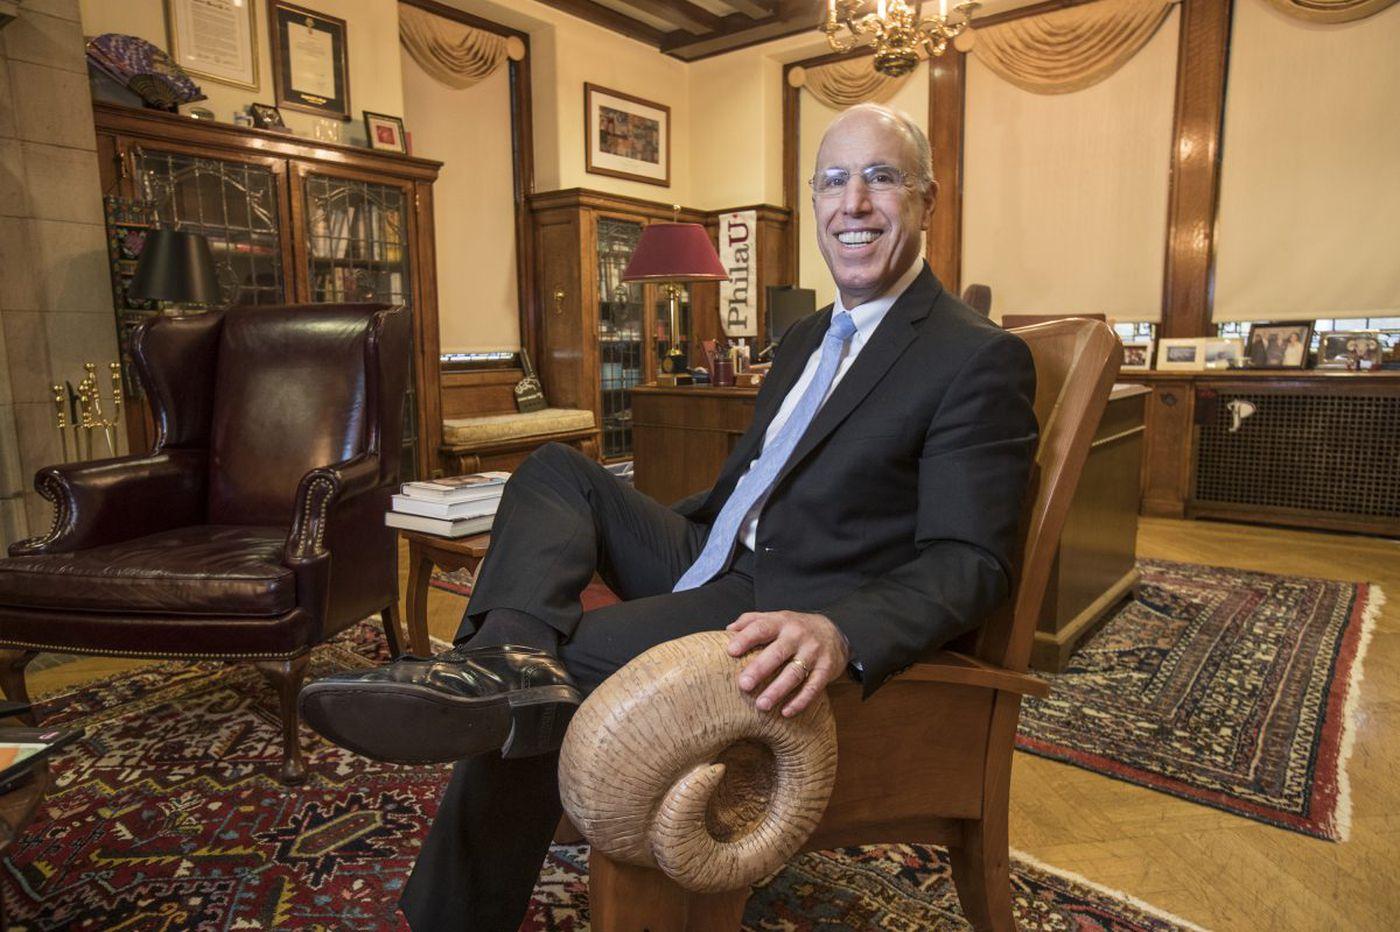 Former Philadelphia University president Stephen Spinelli Jr. to lead Babson College